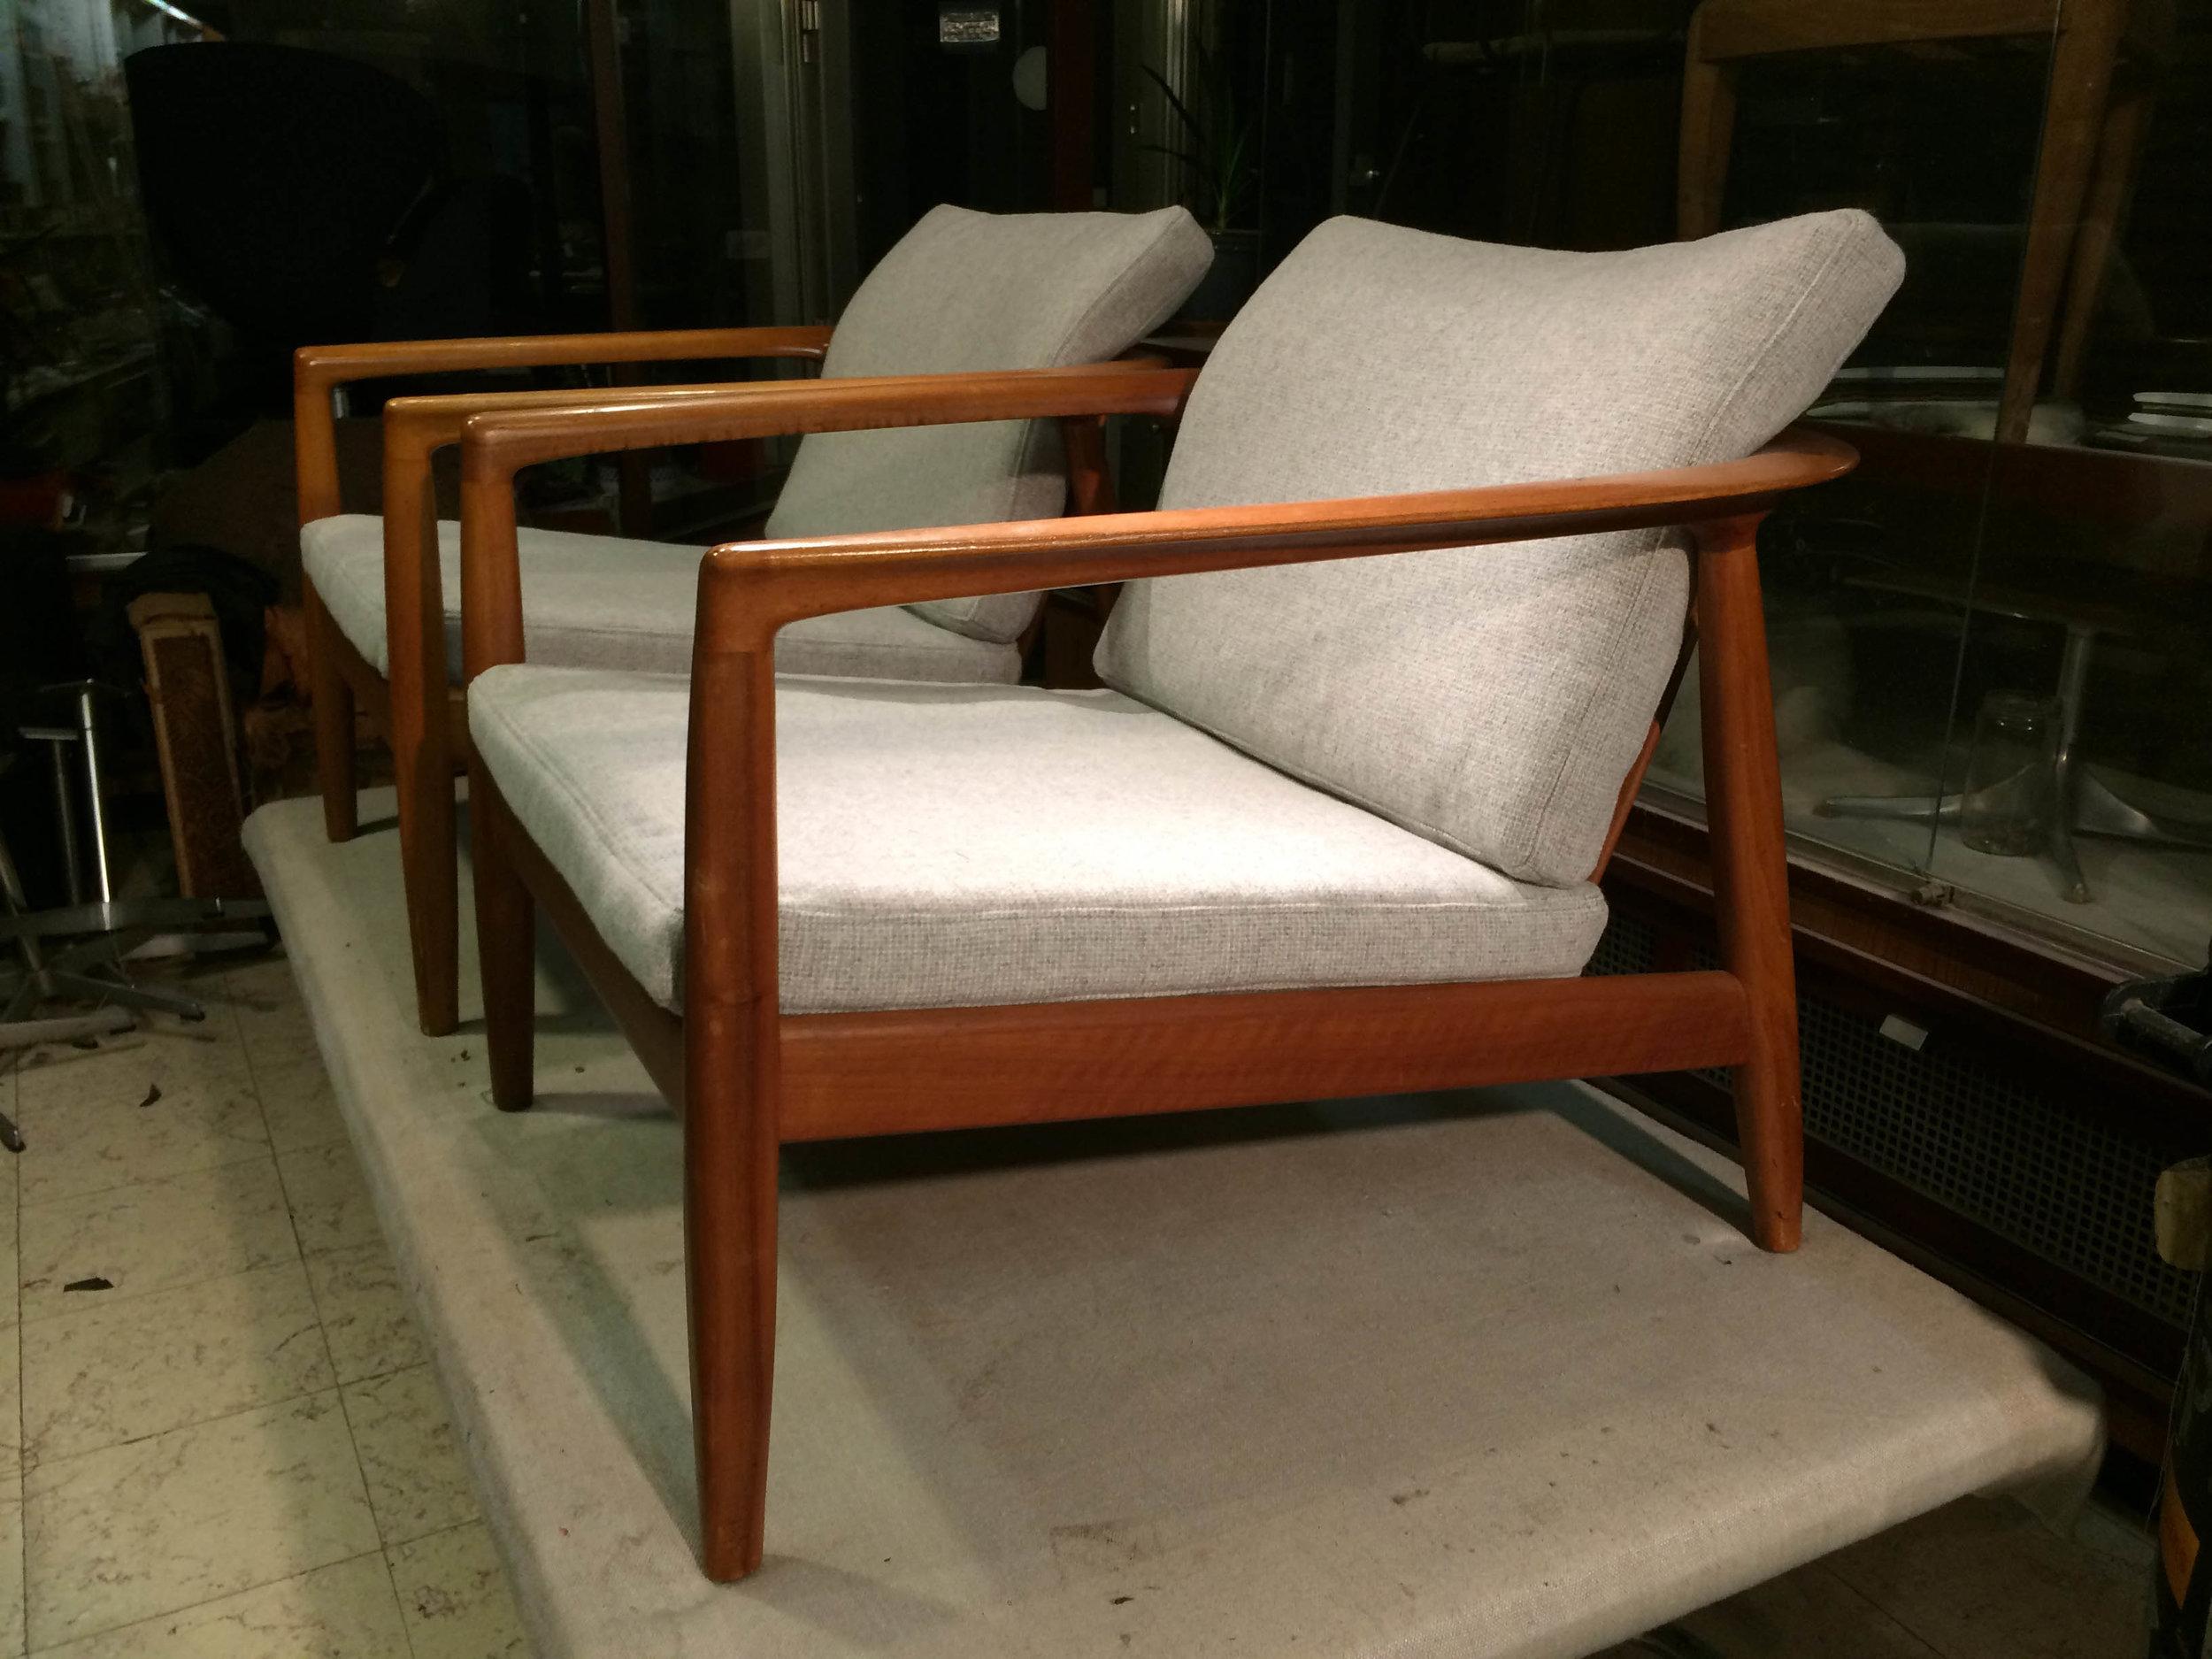 Dux lounge chair, Folke Ohlsson, 1955, Denmark